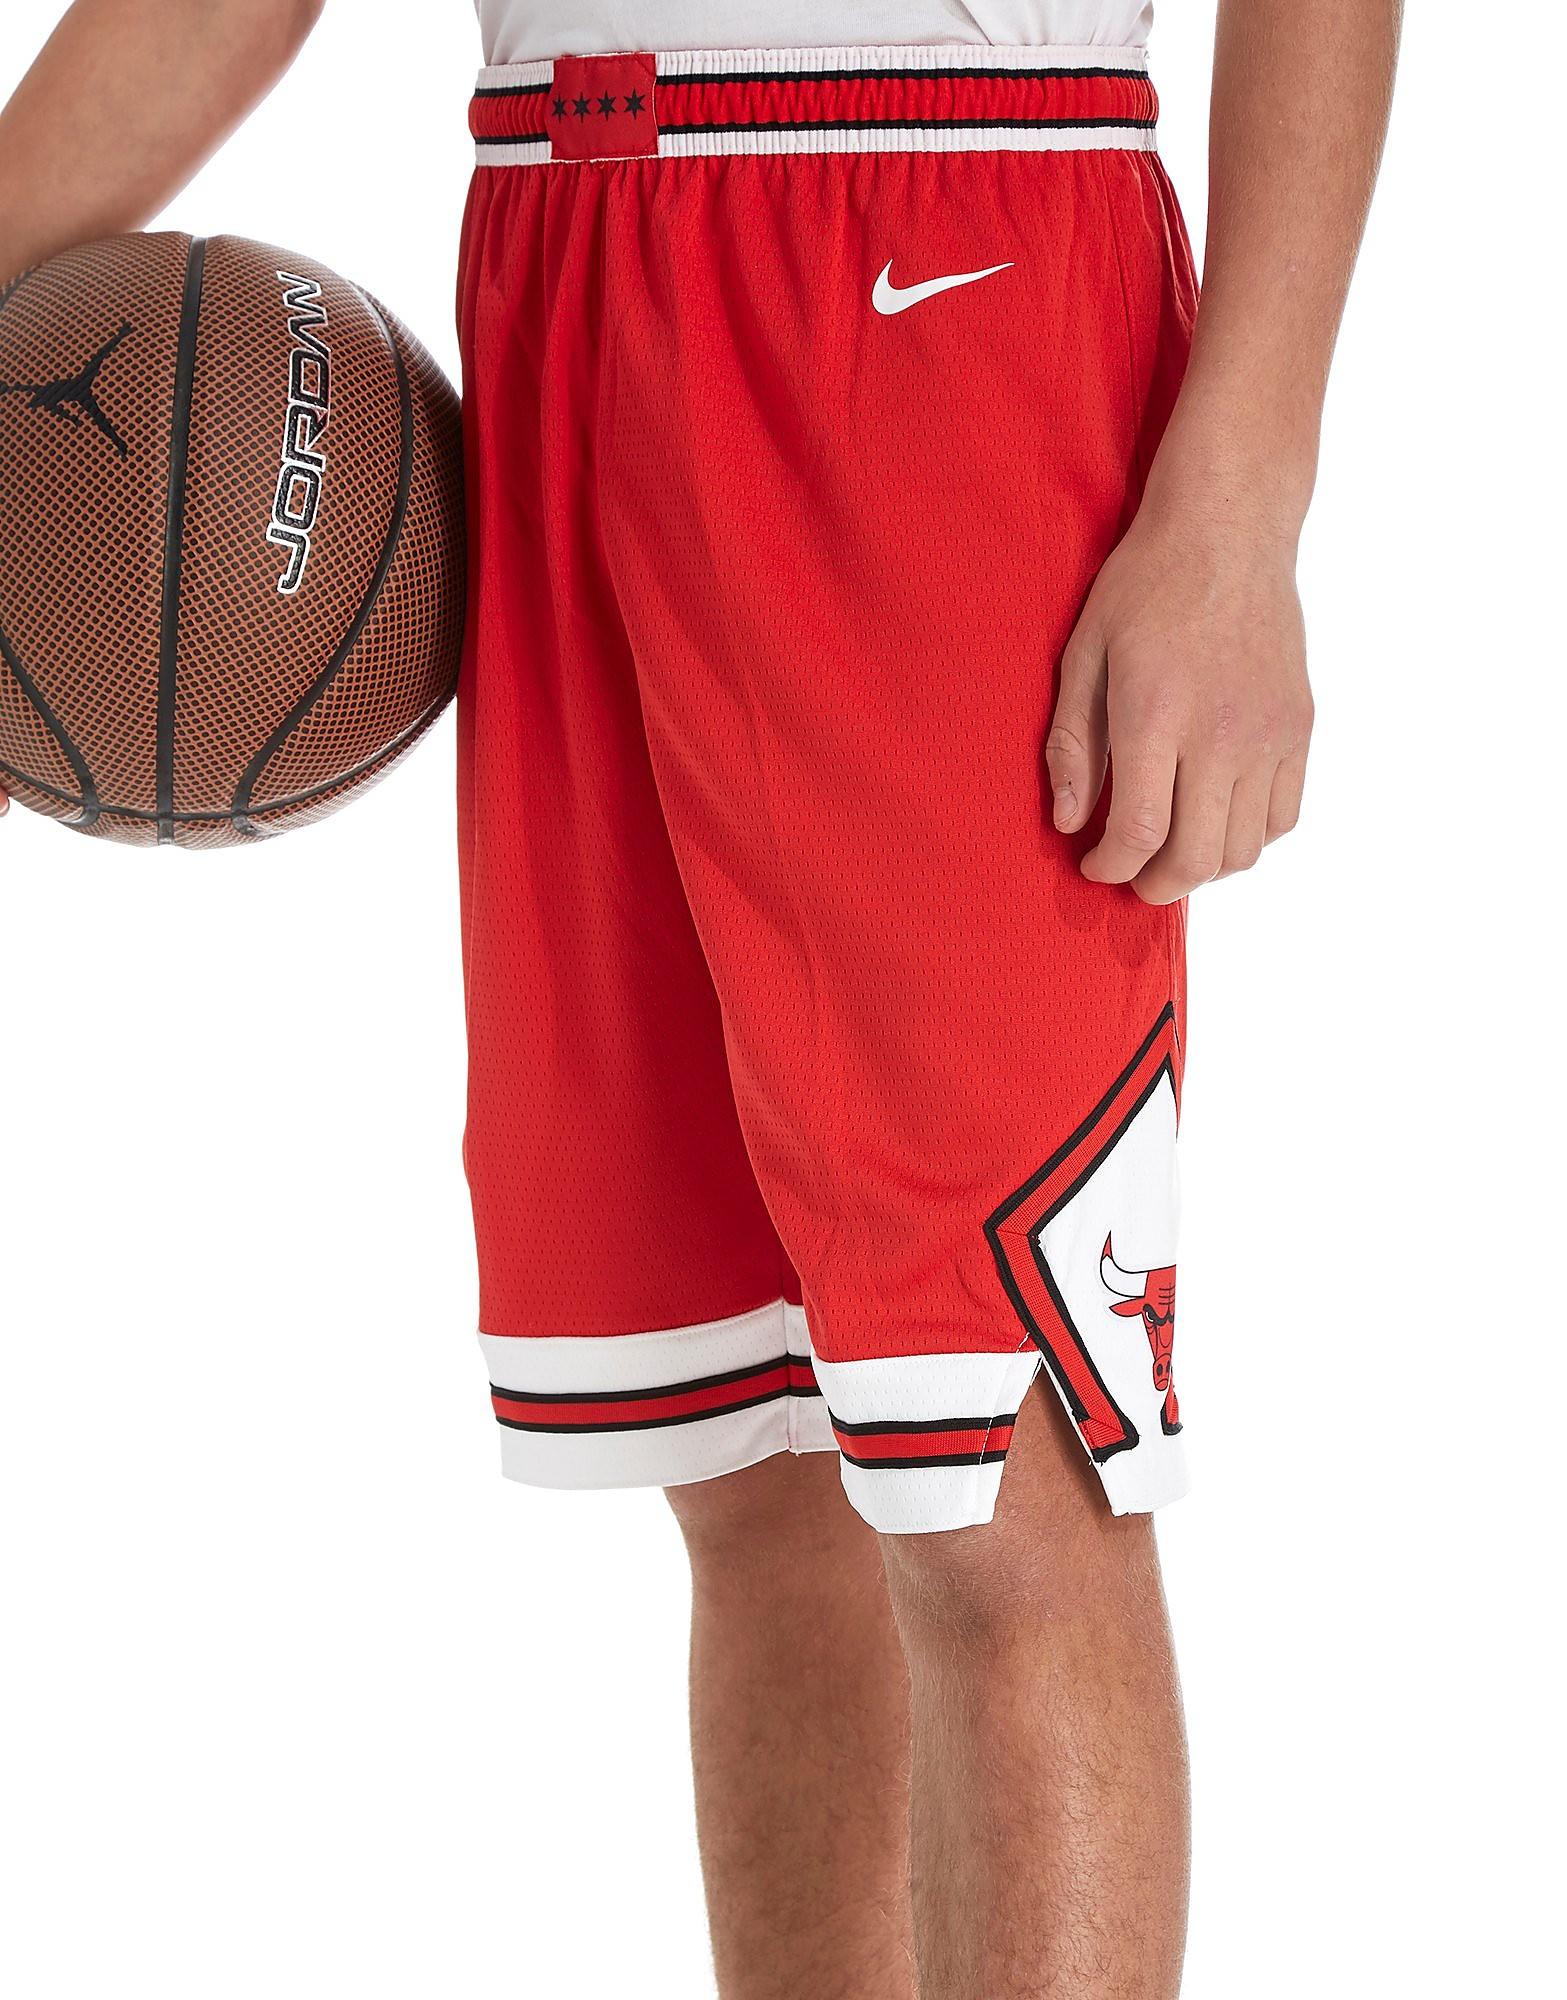 Nike Chicago Bulls Swingman Shorts Junior - Red, Red